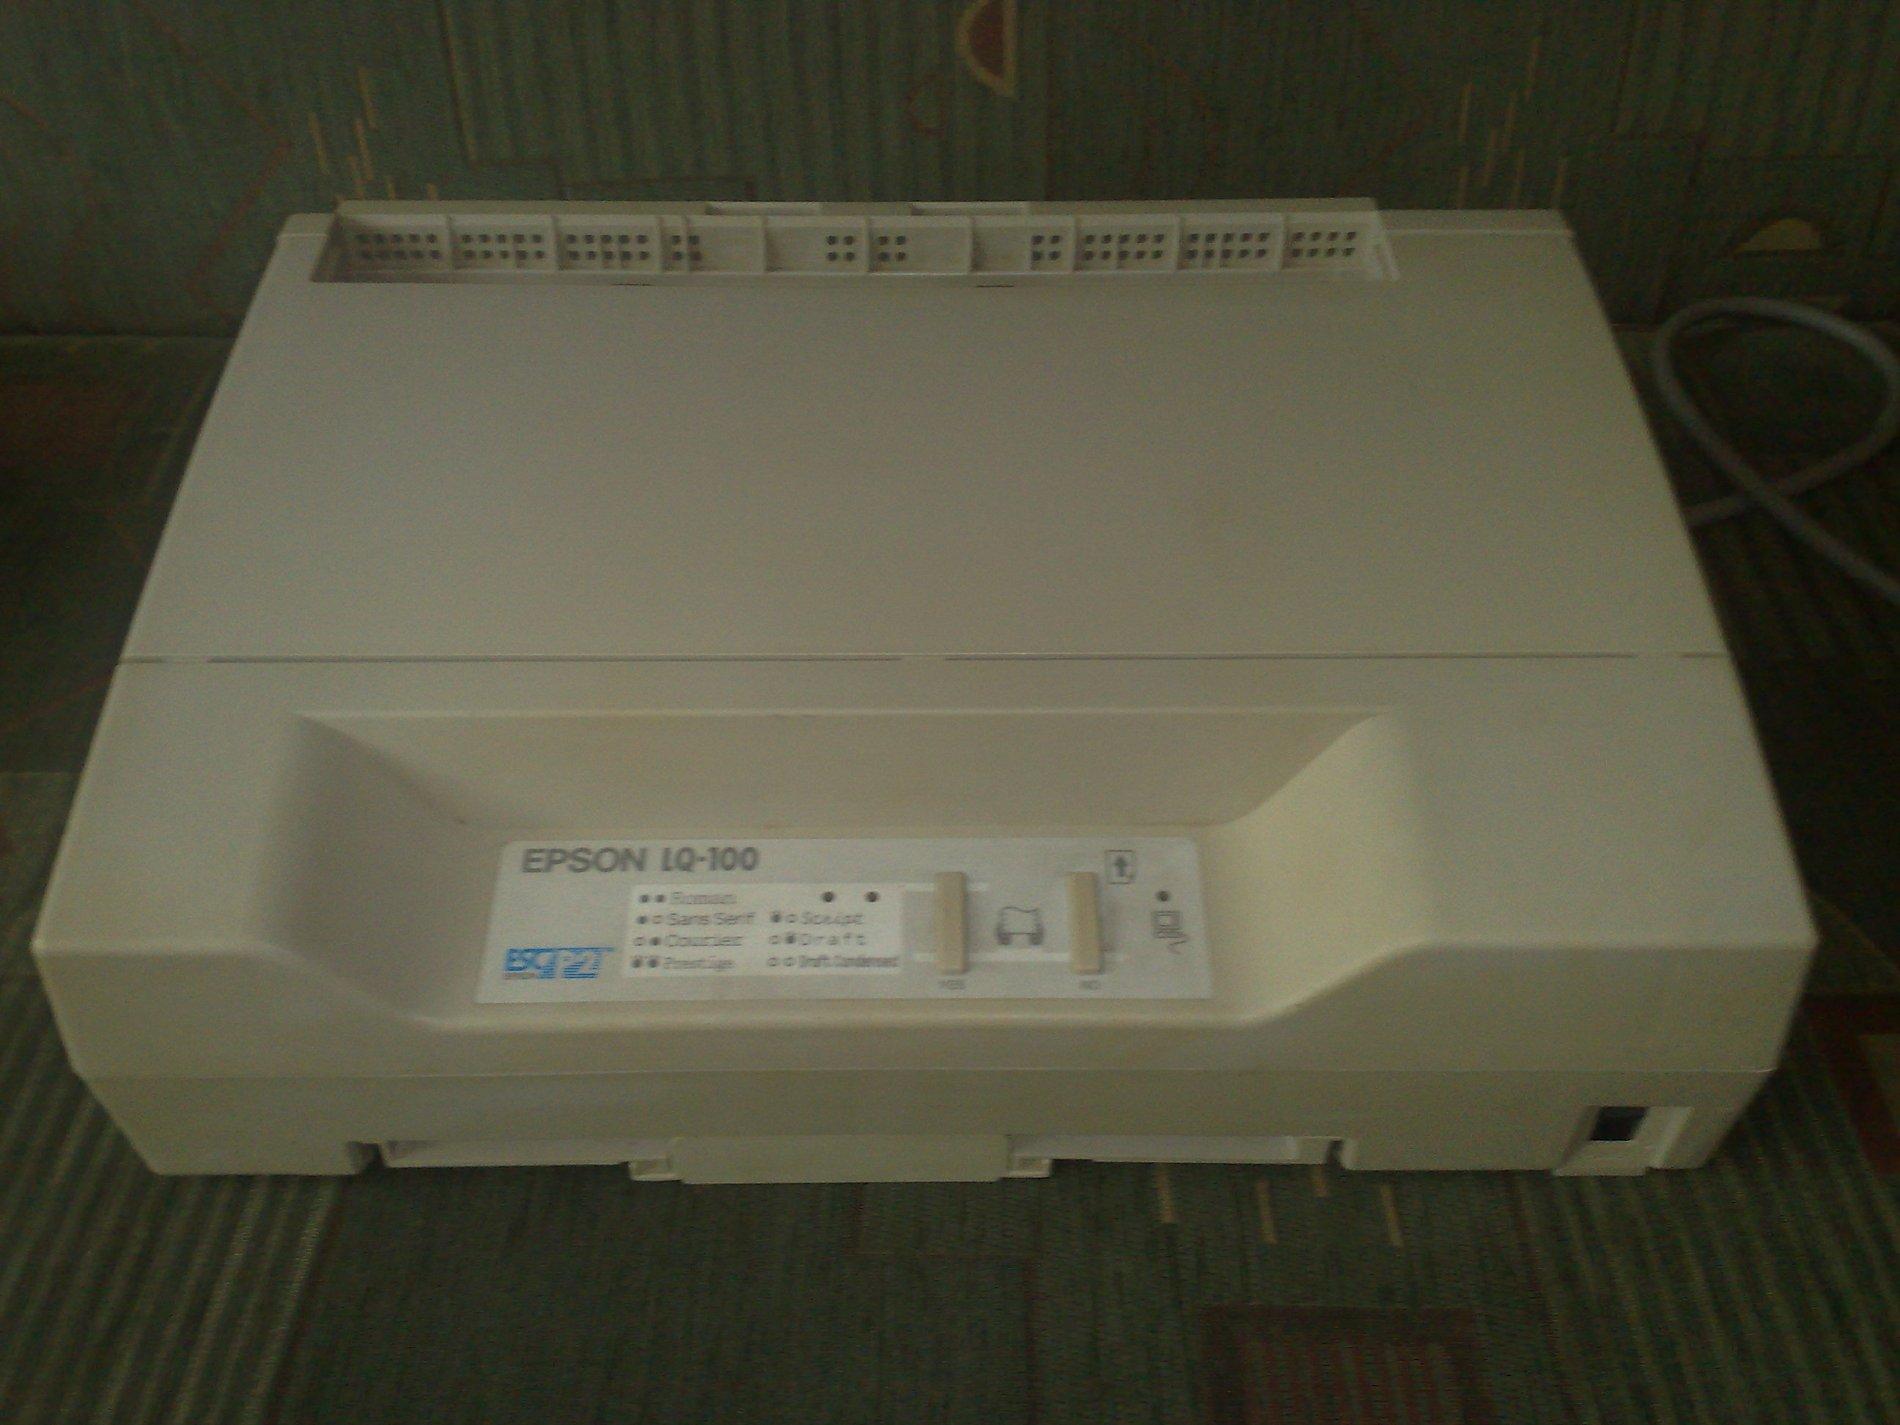 Epson LQ-100